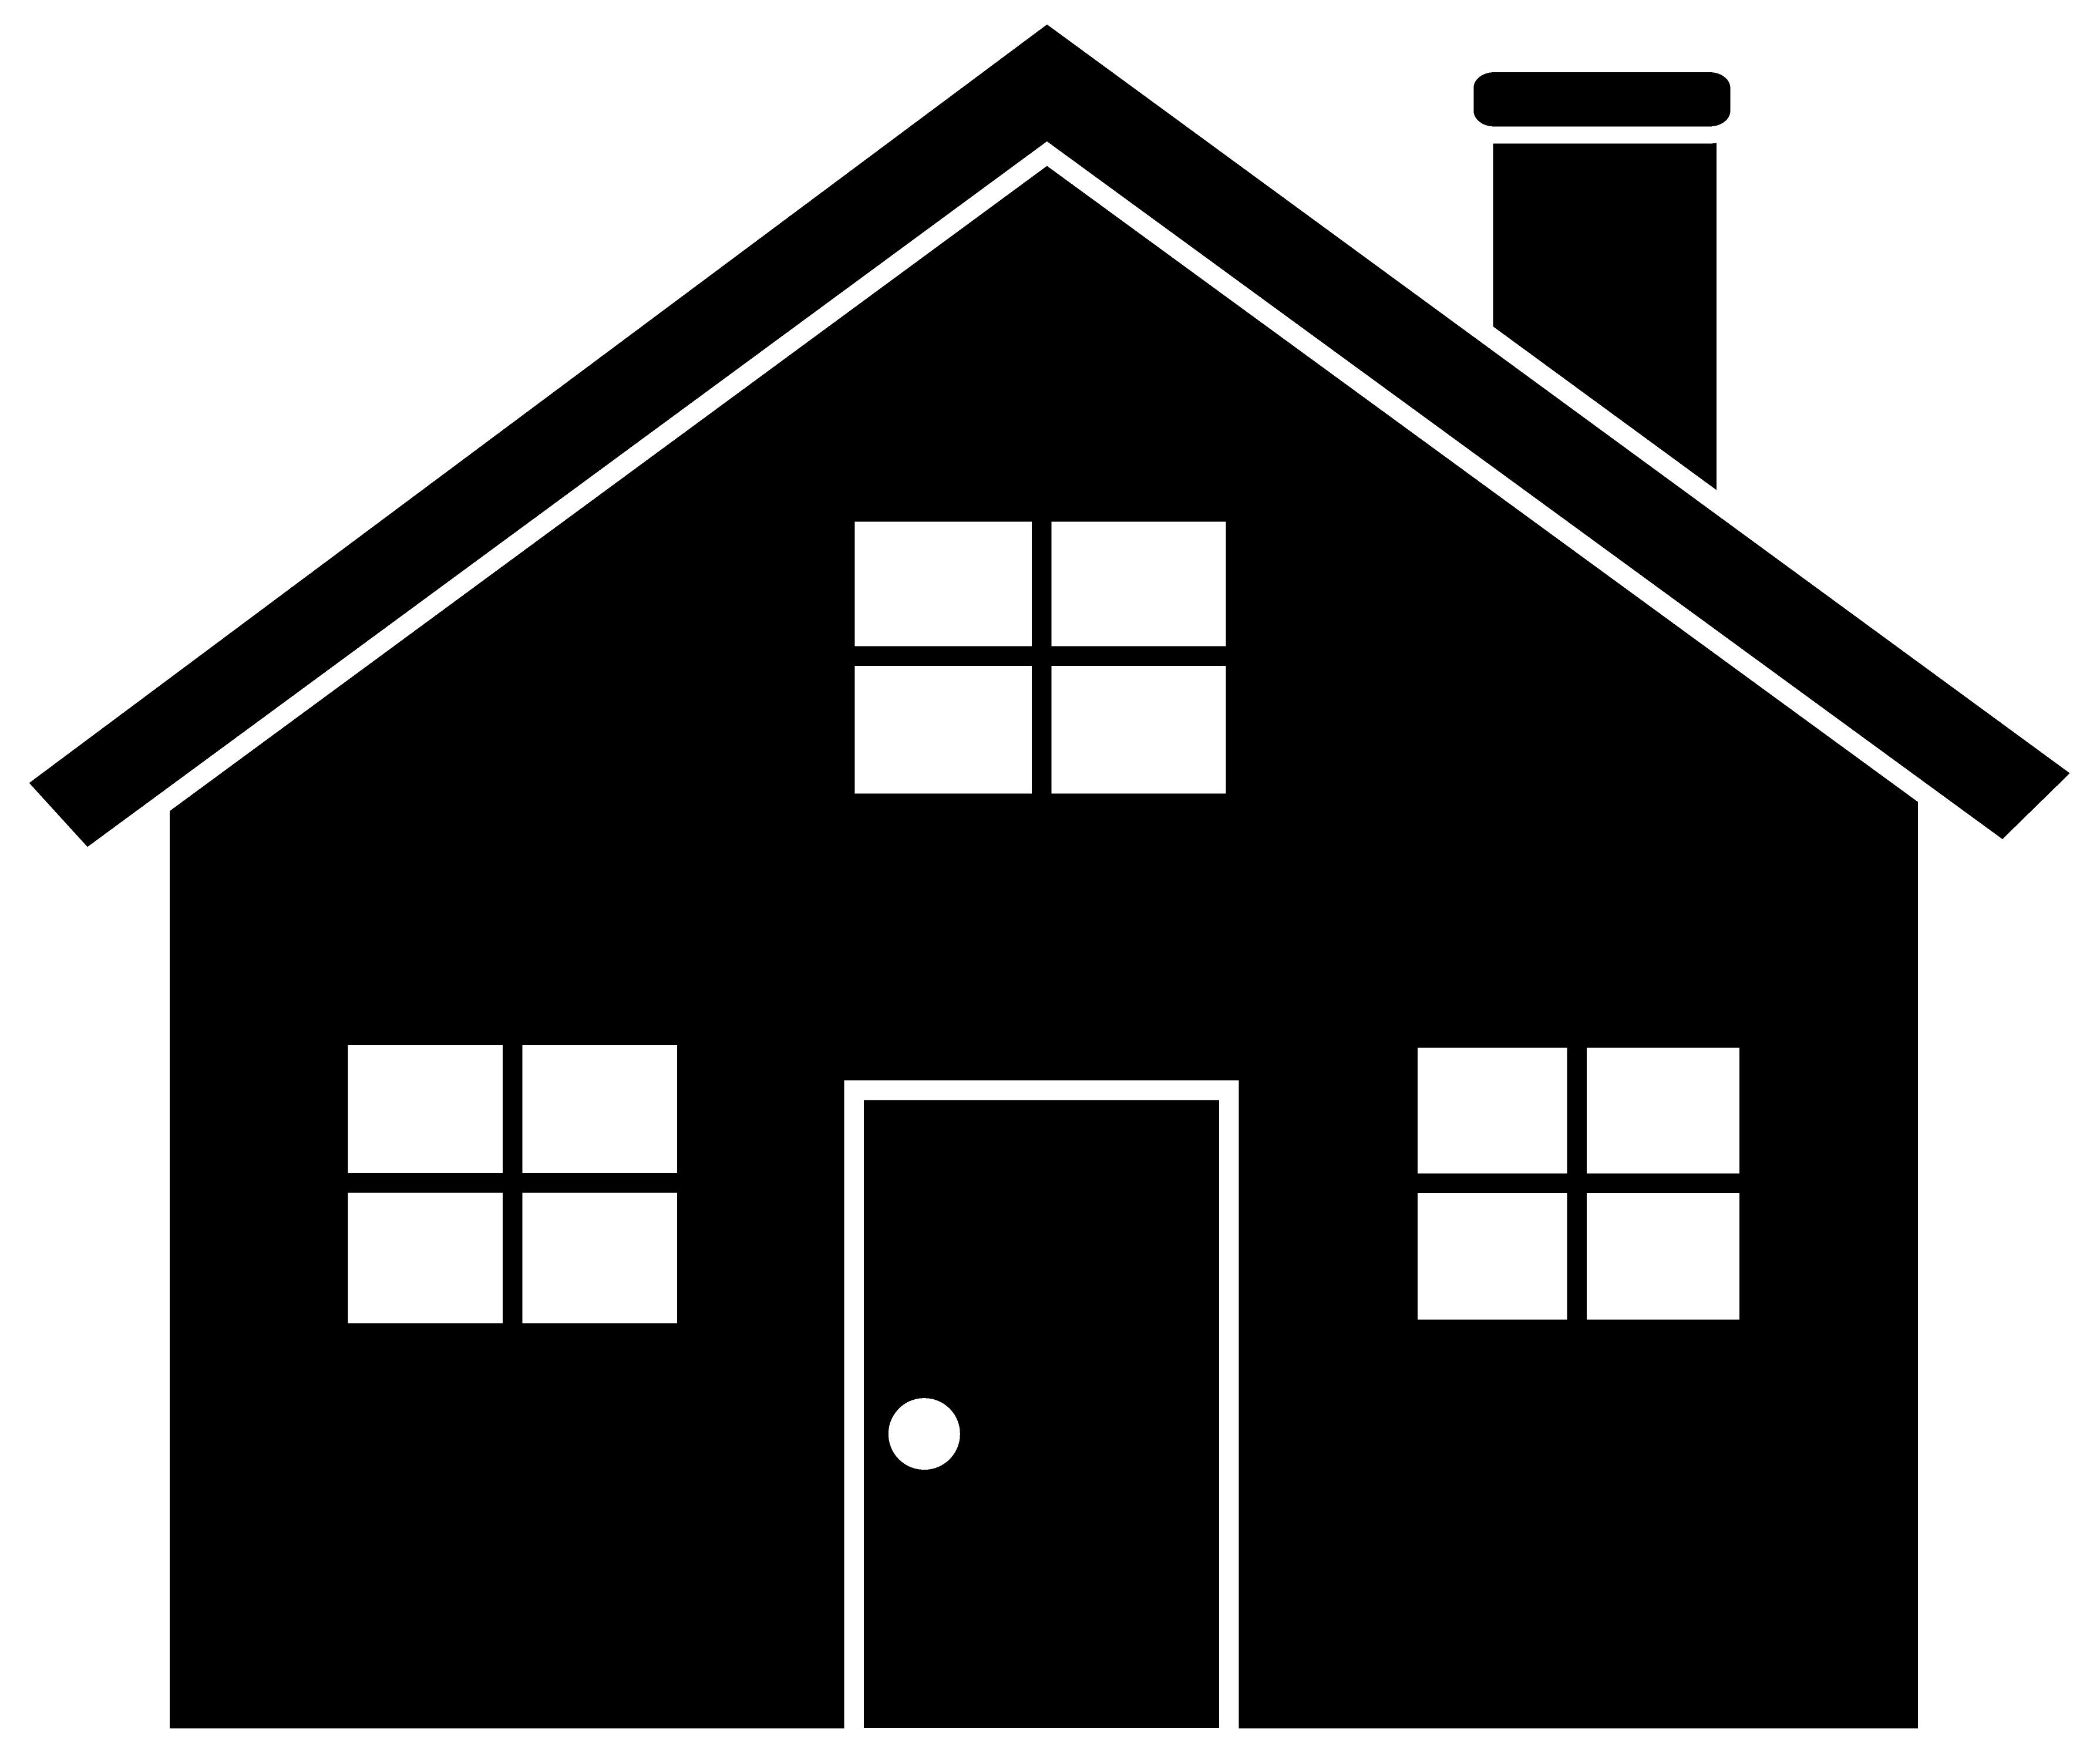 A logo of a house